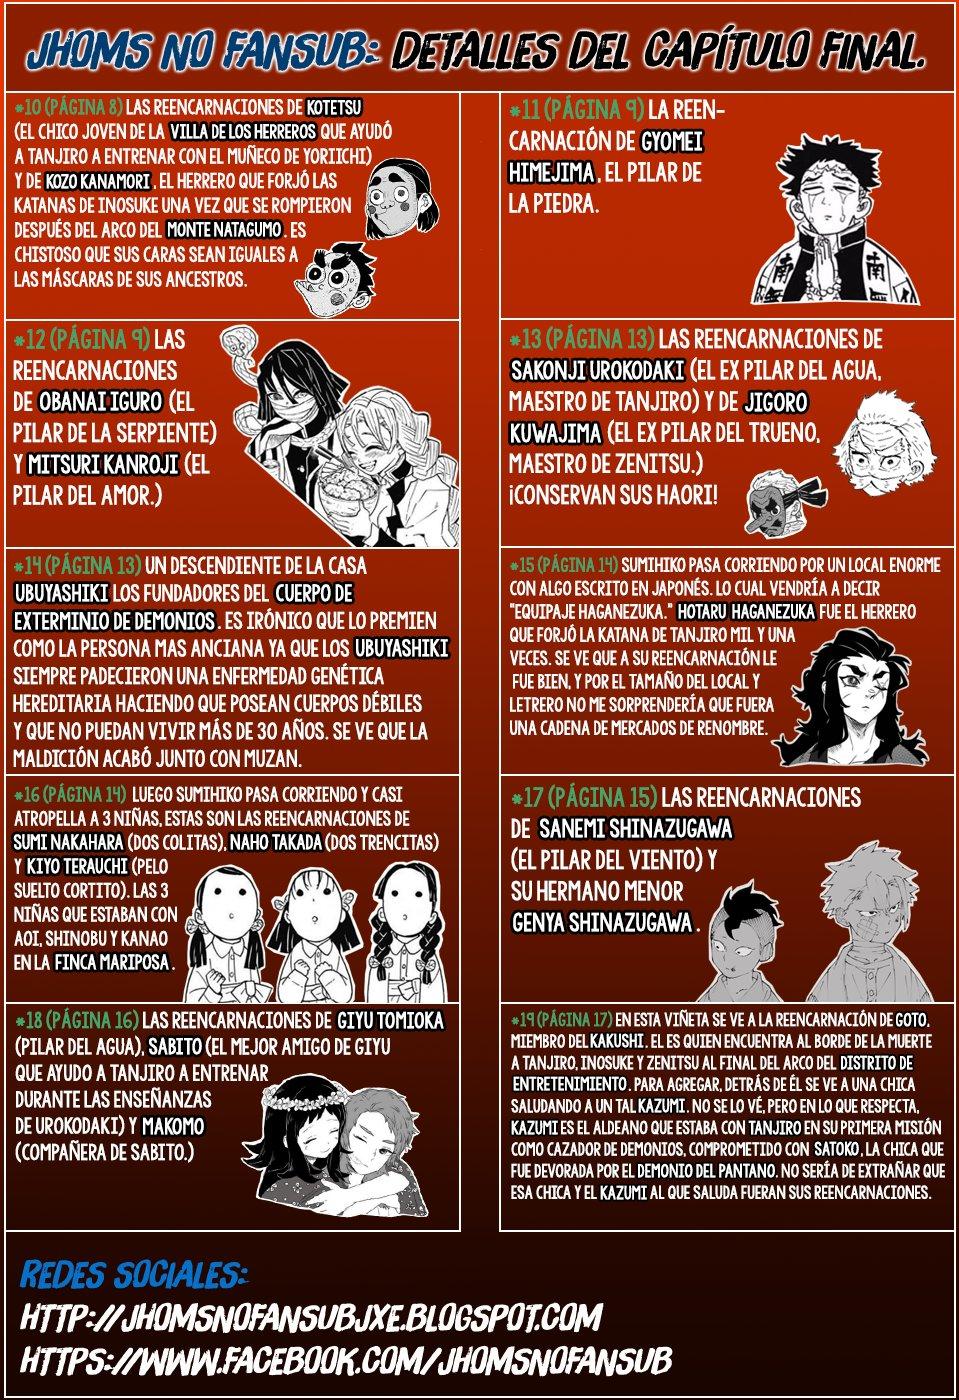 https://nine.mangadogs.com/es_manga/pic8/3/19331/946720/6e57a30d42233829bb65aab0262e463b.jpg Page 25